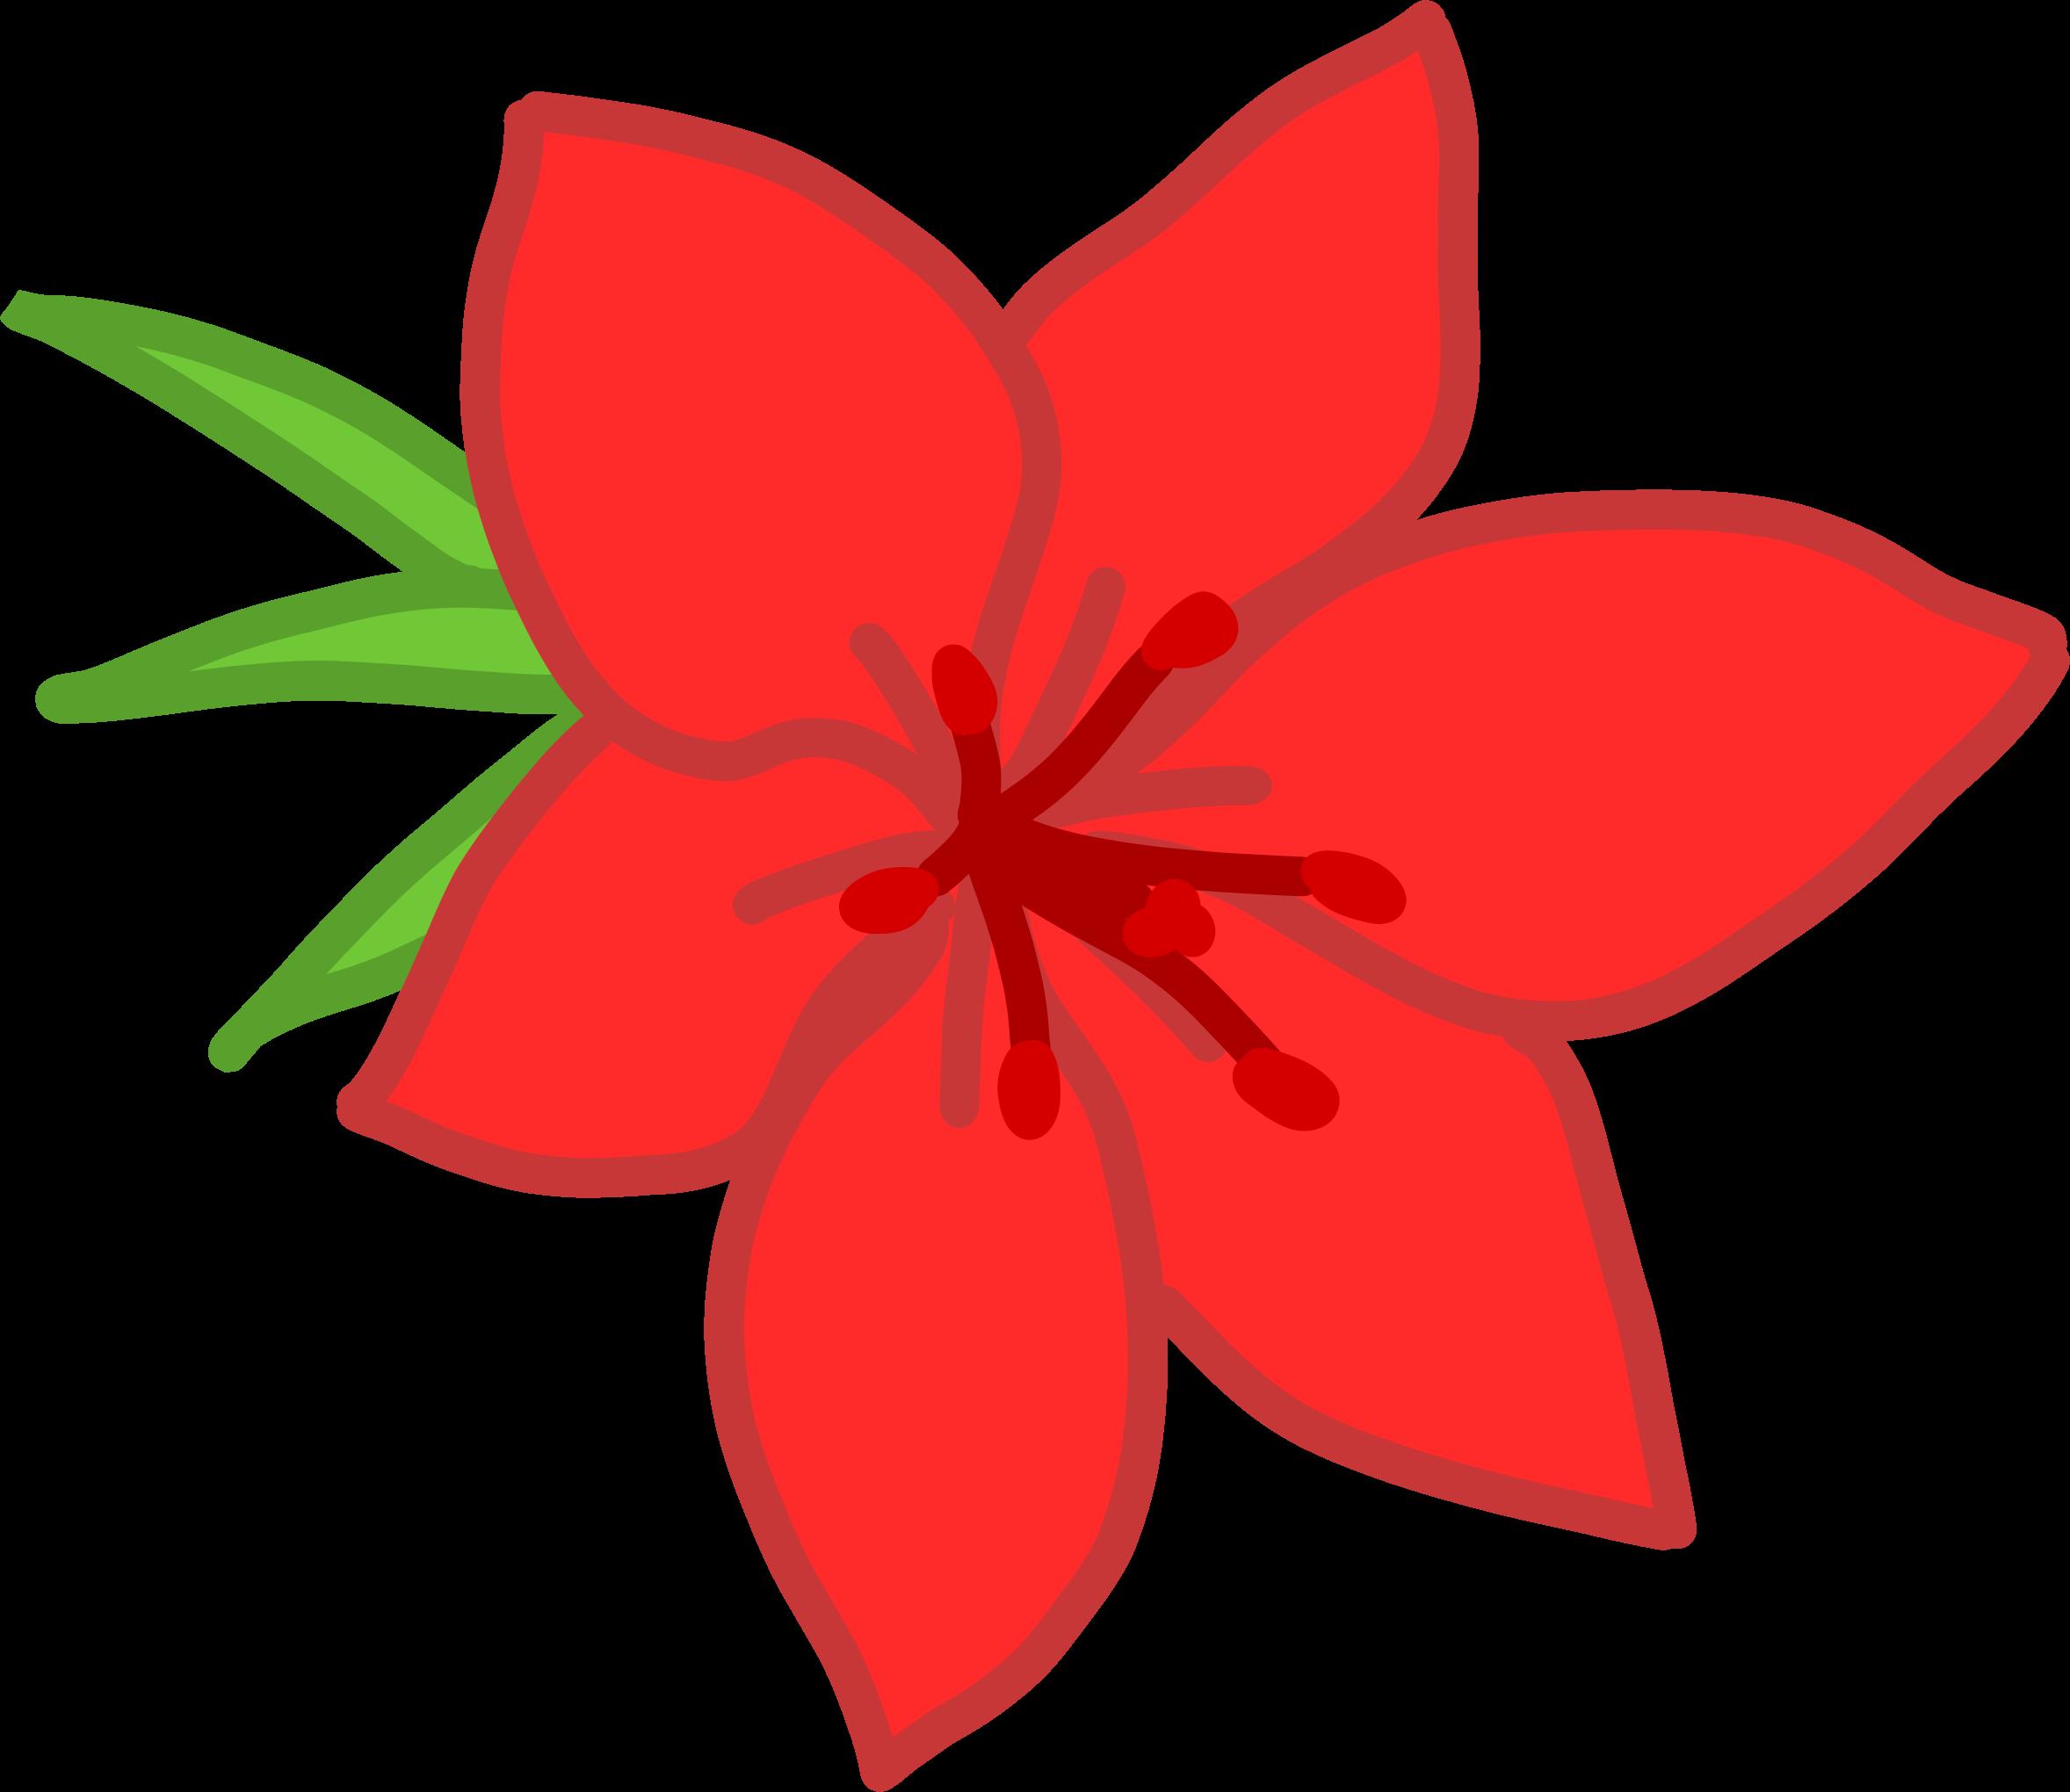 Red flower by @Kib, (fr) Une fleur rouge.(en) A red flower., on @openclipart